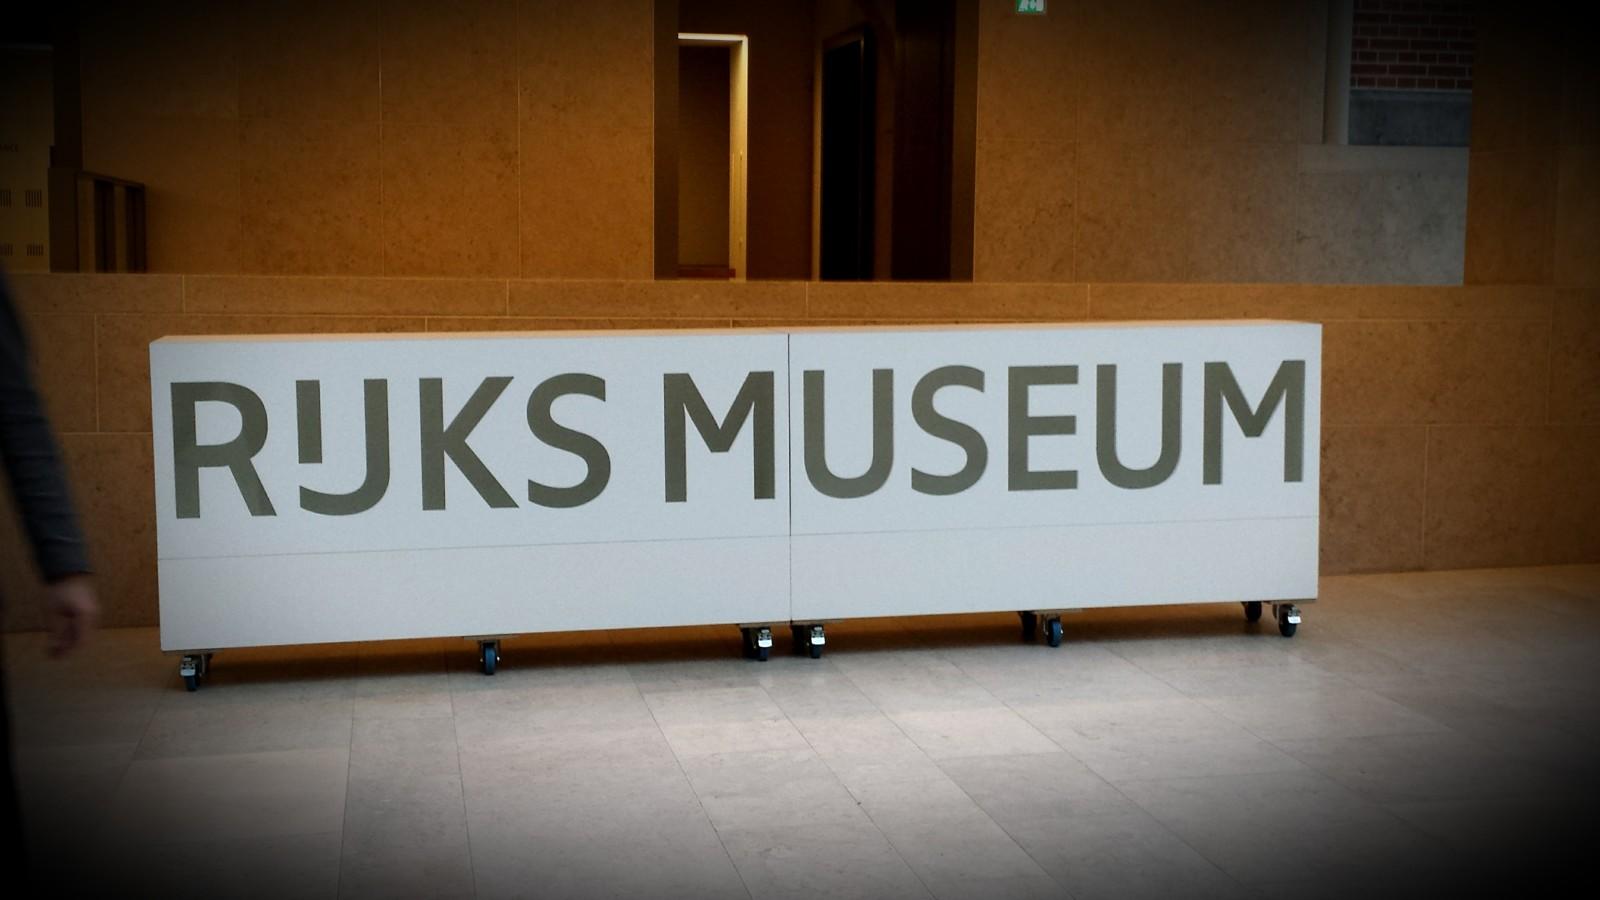 20141003_090336 Rijksmuseum